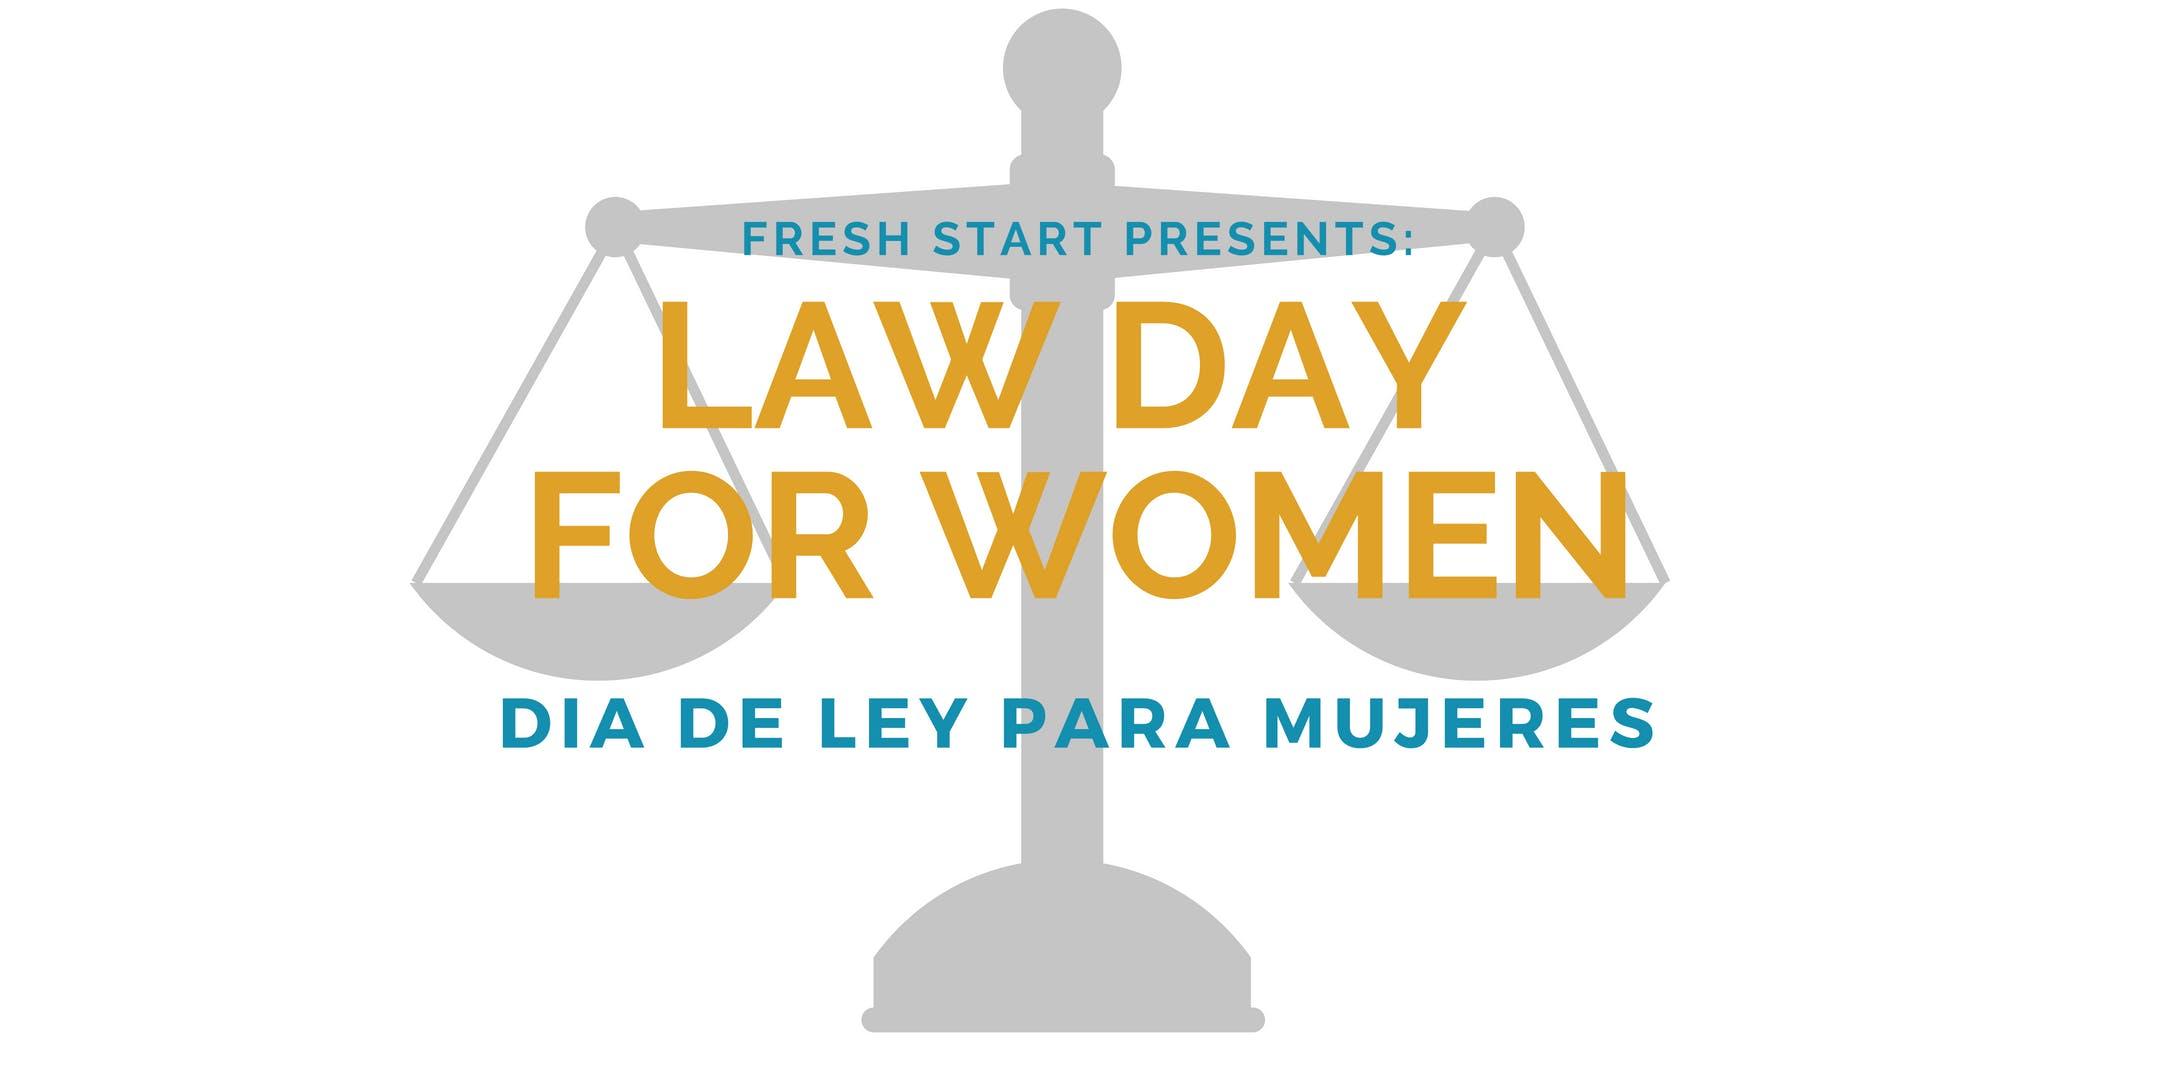 Law Day for Women / Dia De Ley Para Mujeres